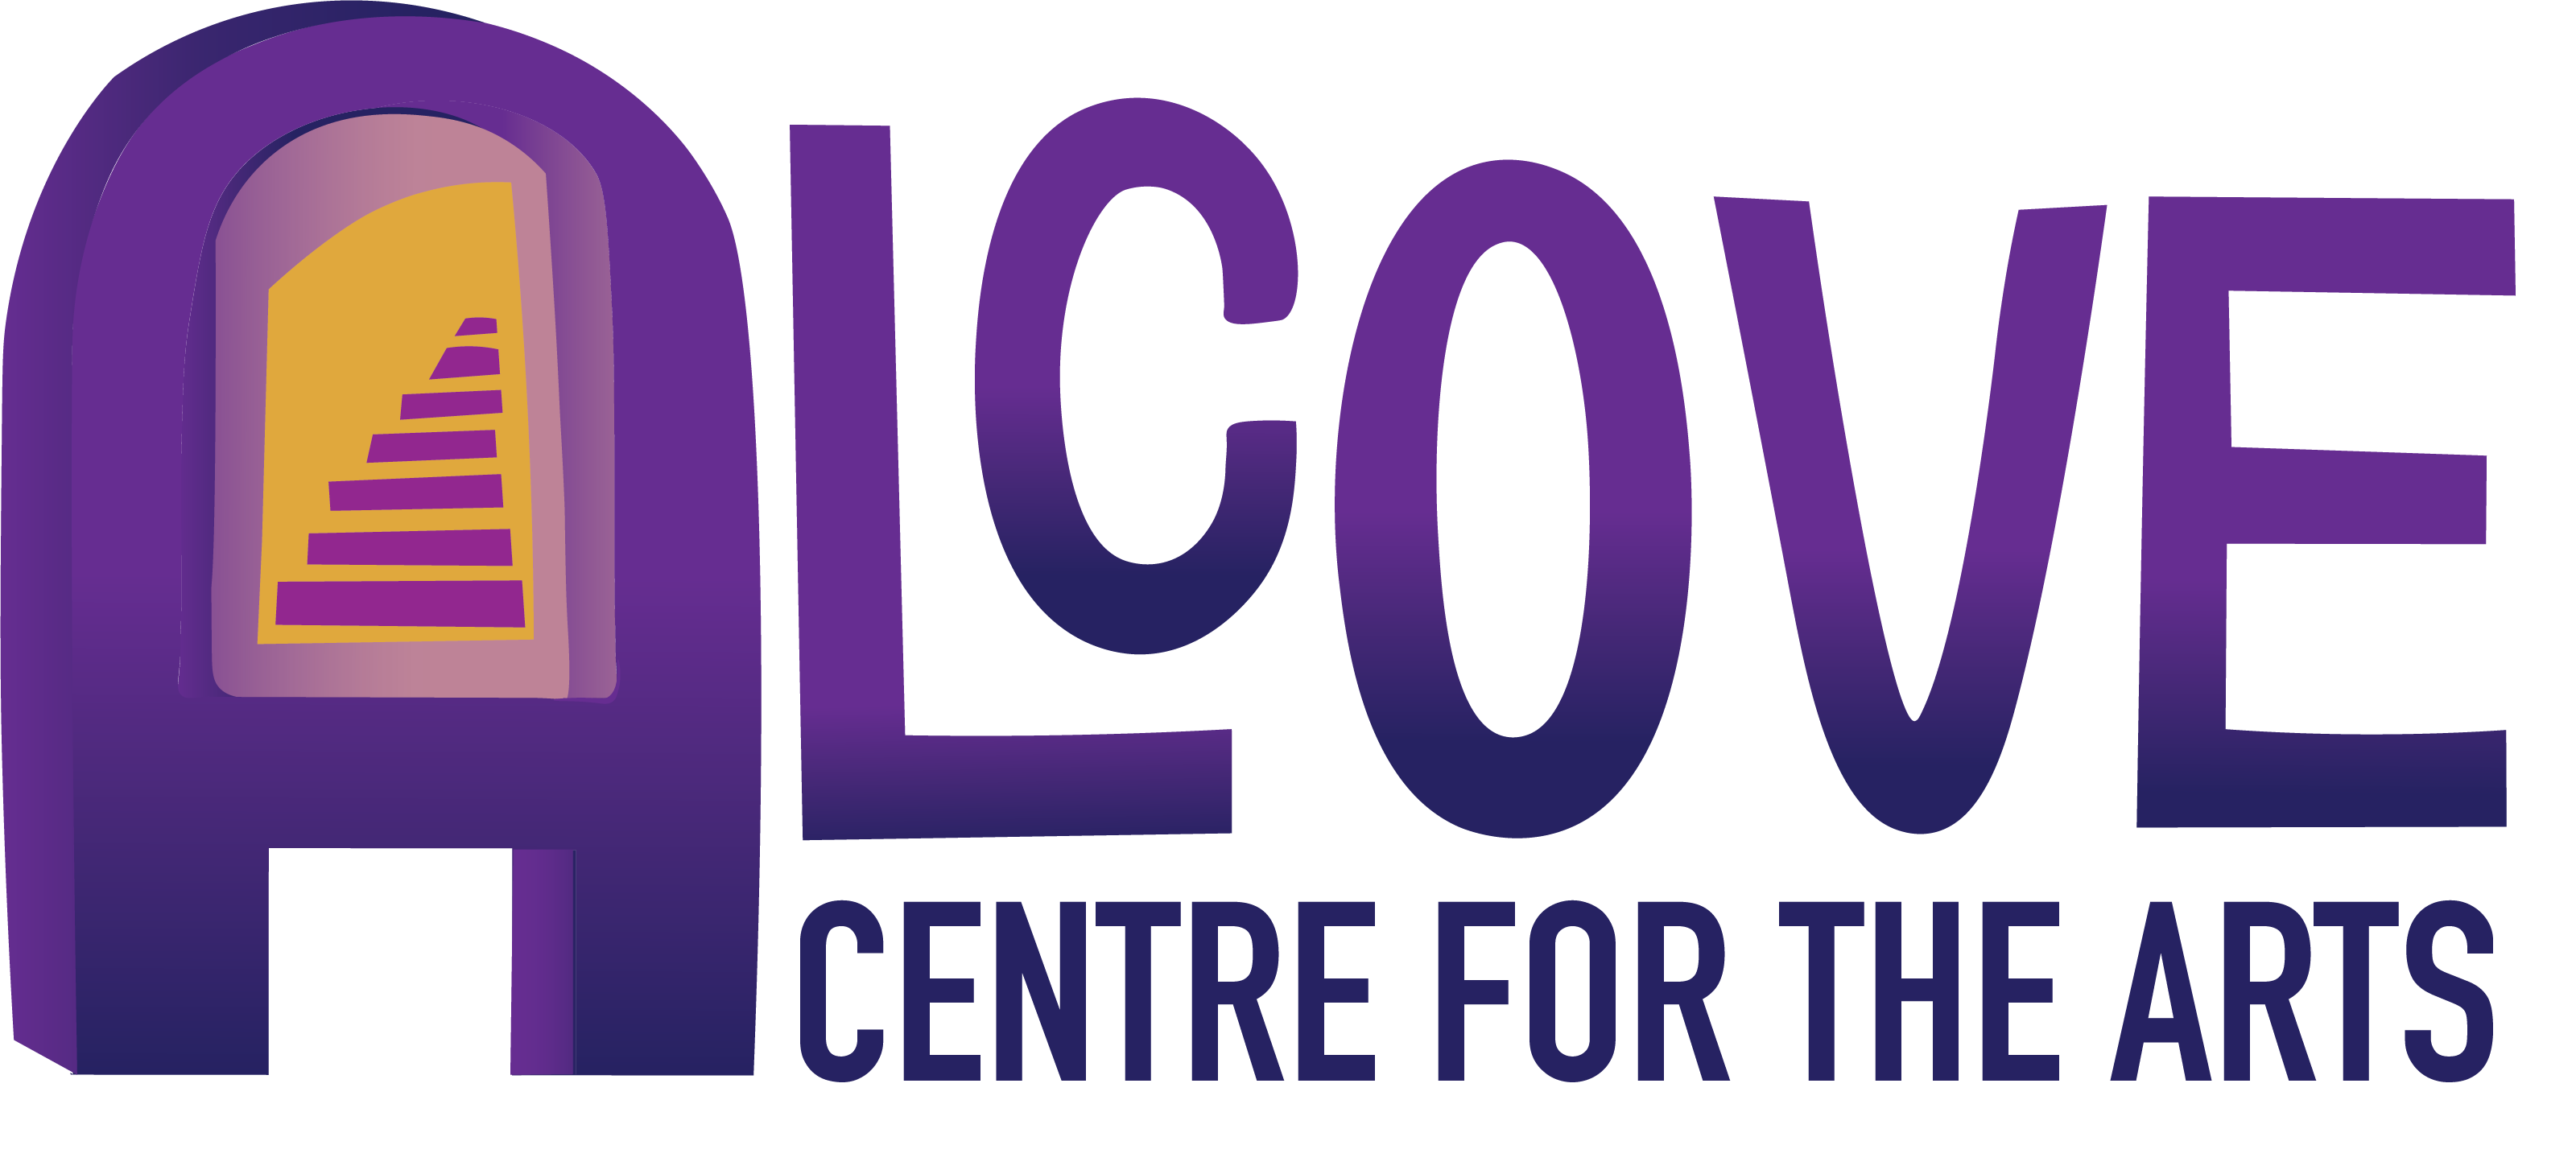 The Alcove Centre for the Arts